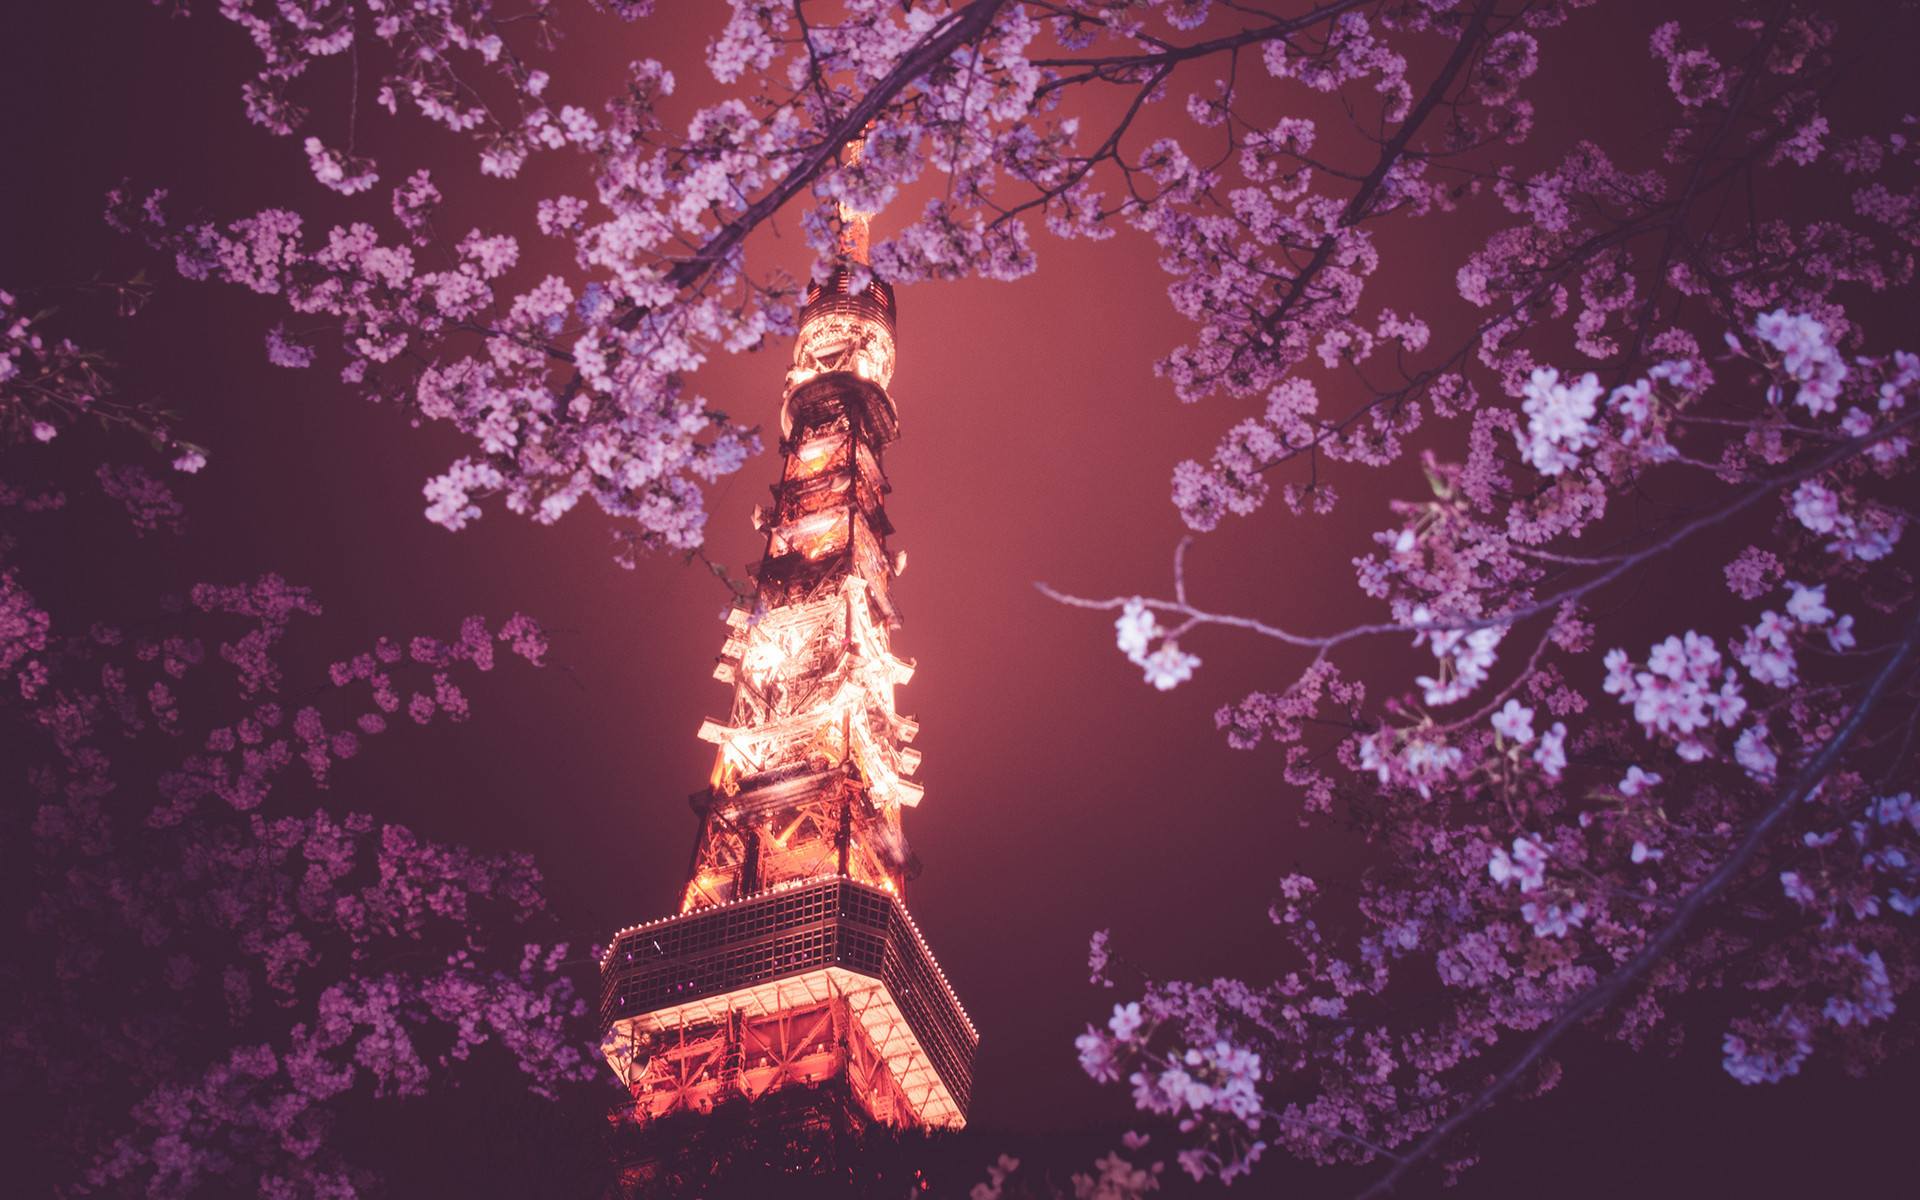 Sakura Blossom Wallpaper Free Sakura Blossom Background Free .